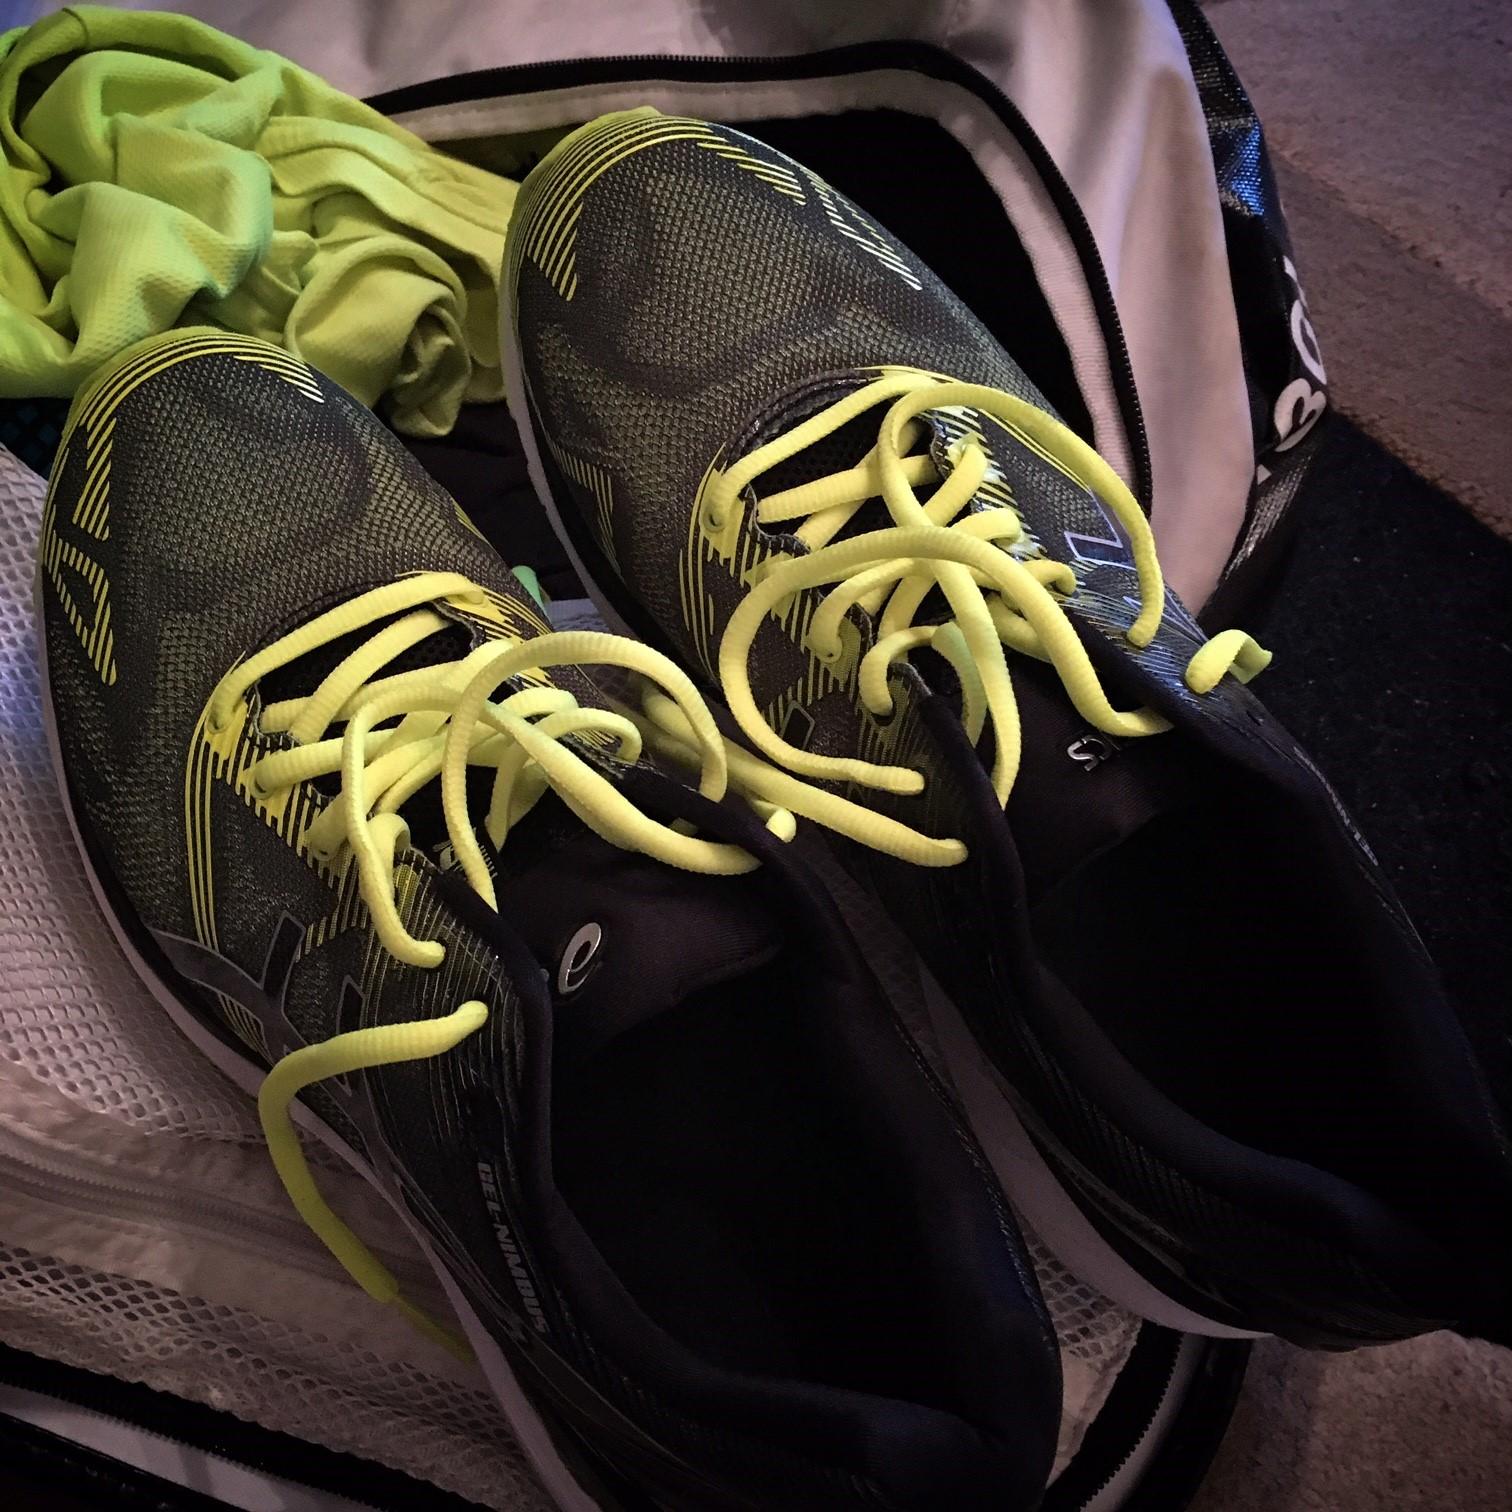 New shoes this year - Asics Nimbus